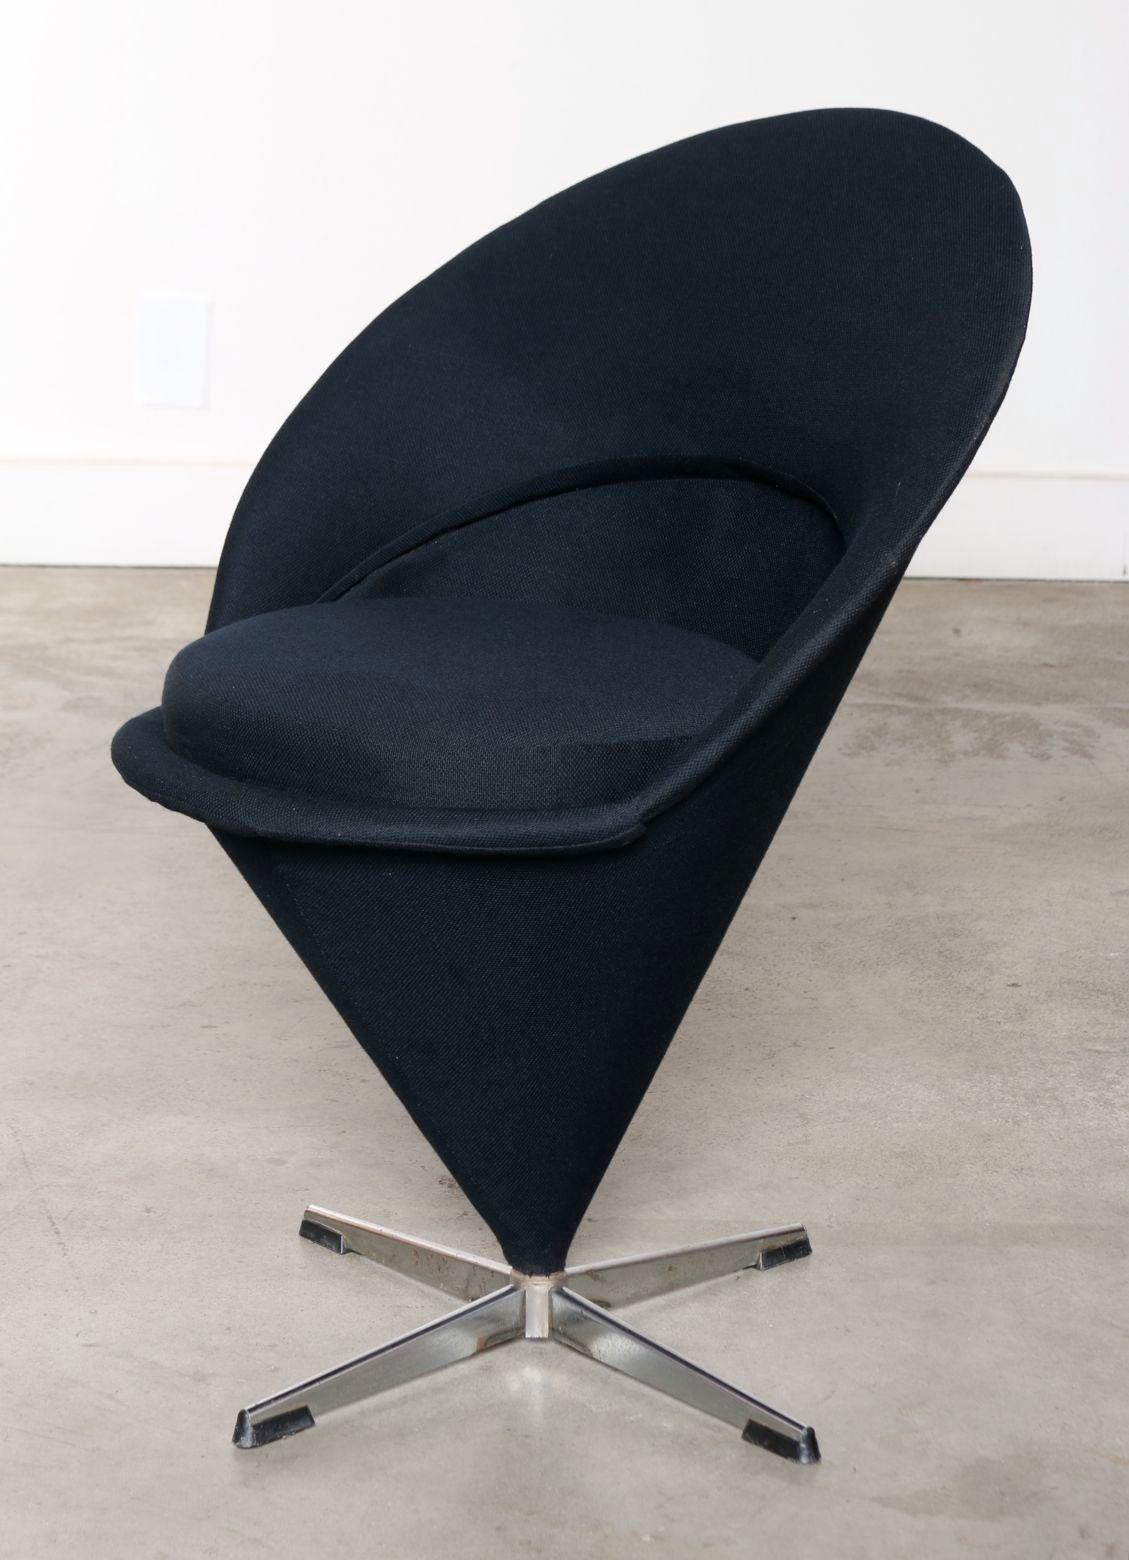 four original 1950s verner panton k1 cone chairs at 1stdibs. Black Bedroom Furniture Sets. Home Design Ideas